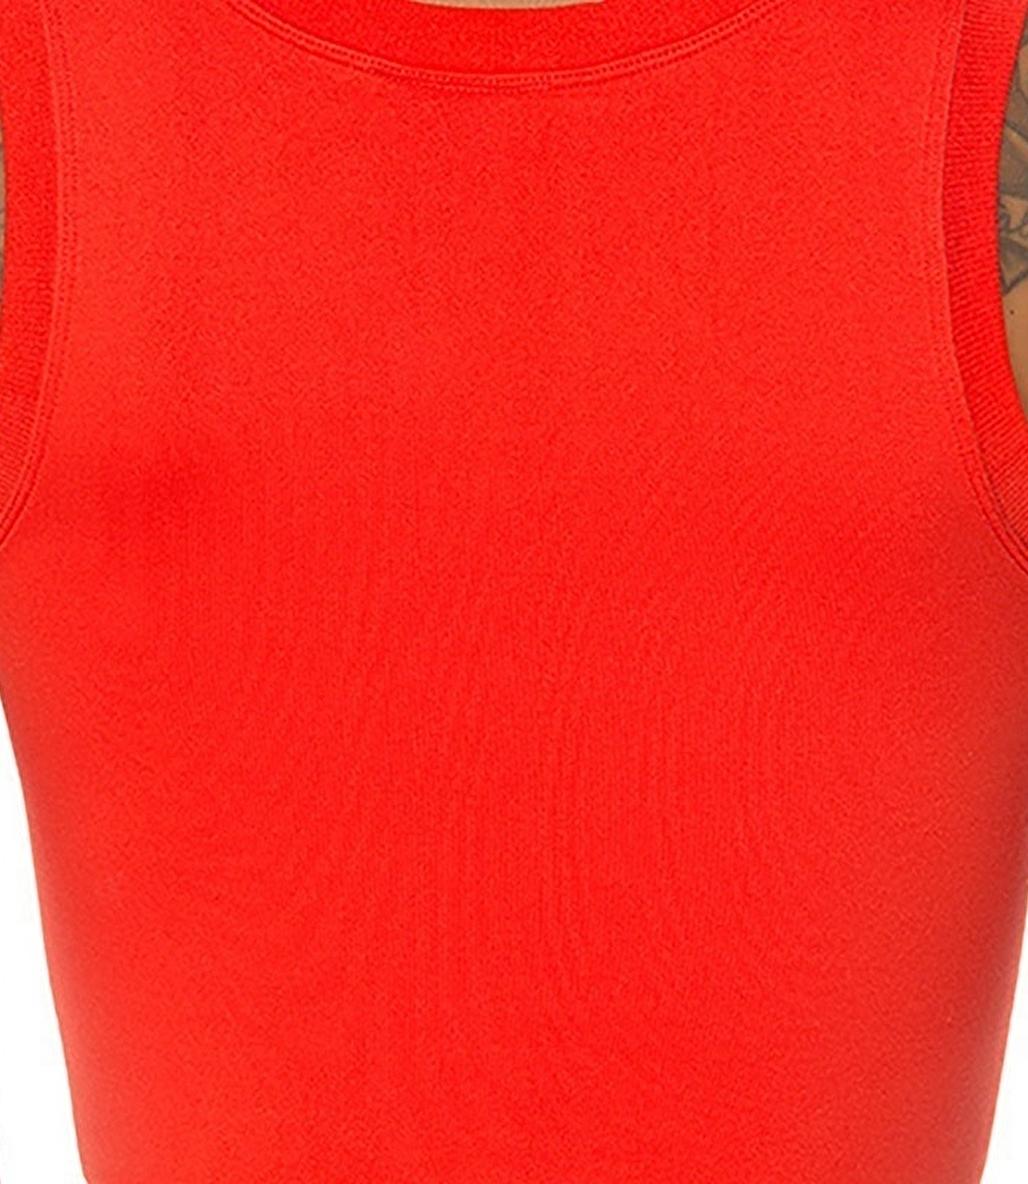 Jerf Linden Crop Top Kırmızı